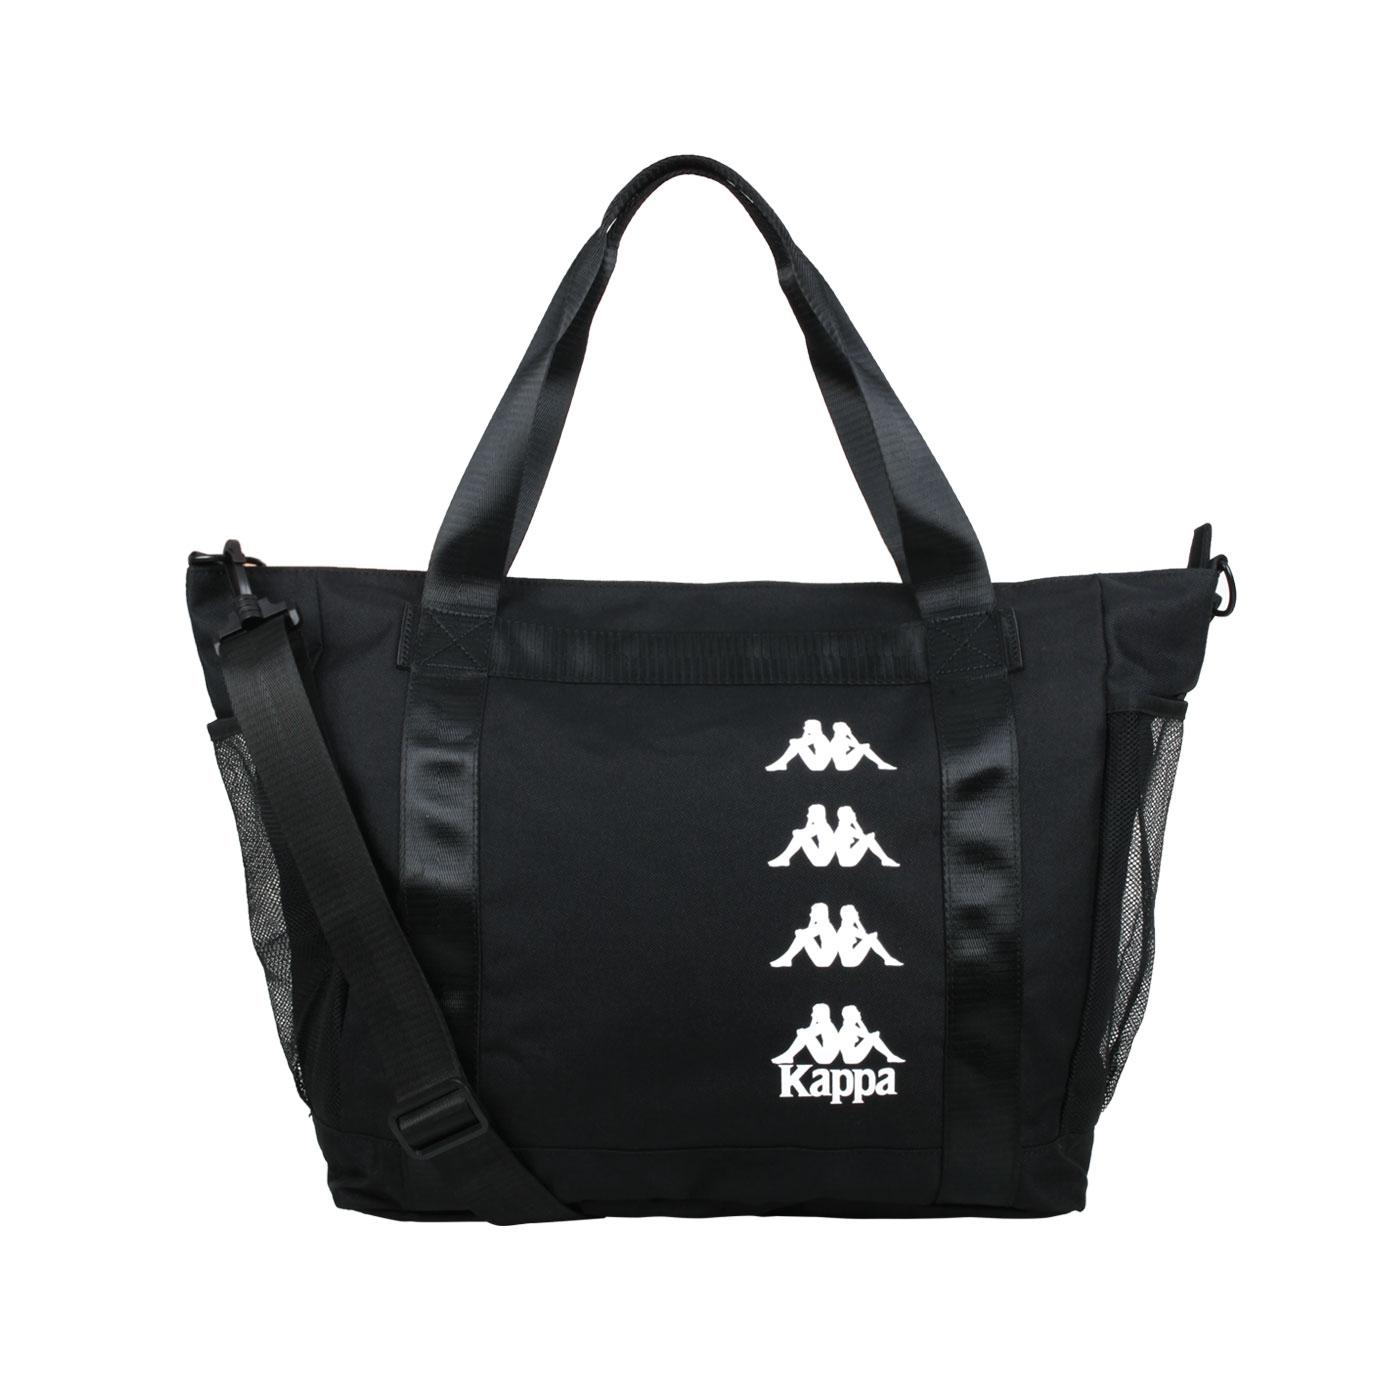 KAPPA 側背包 35168IW-005 - 黑白